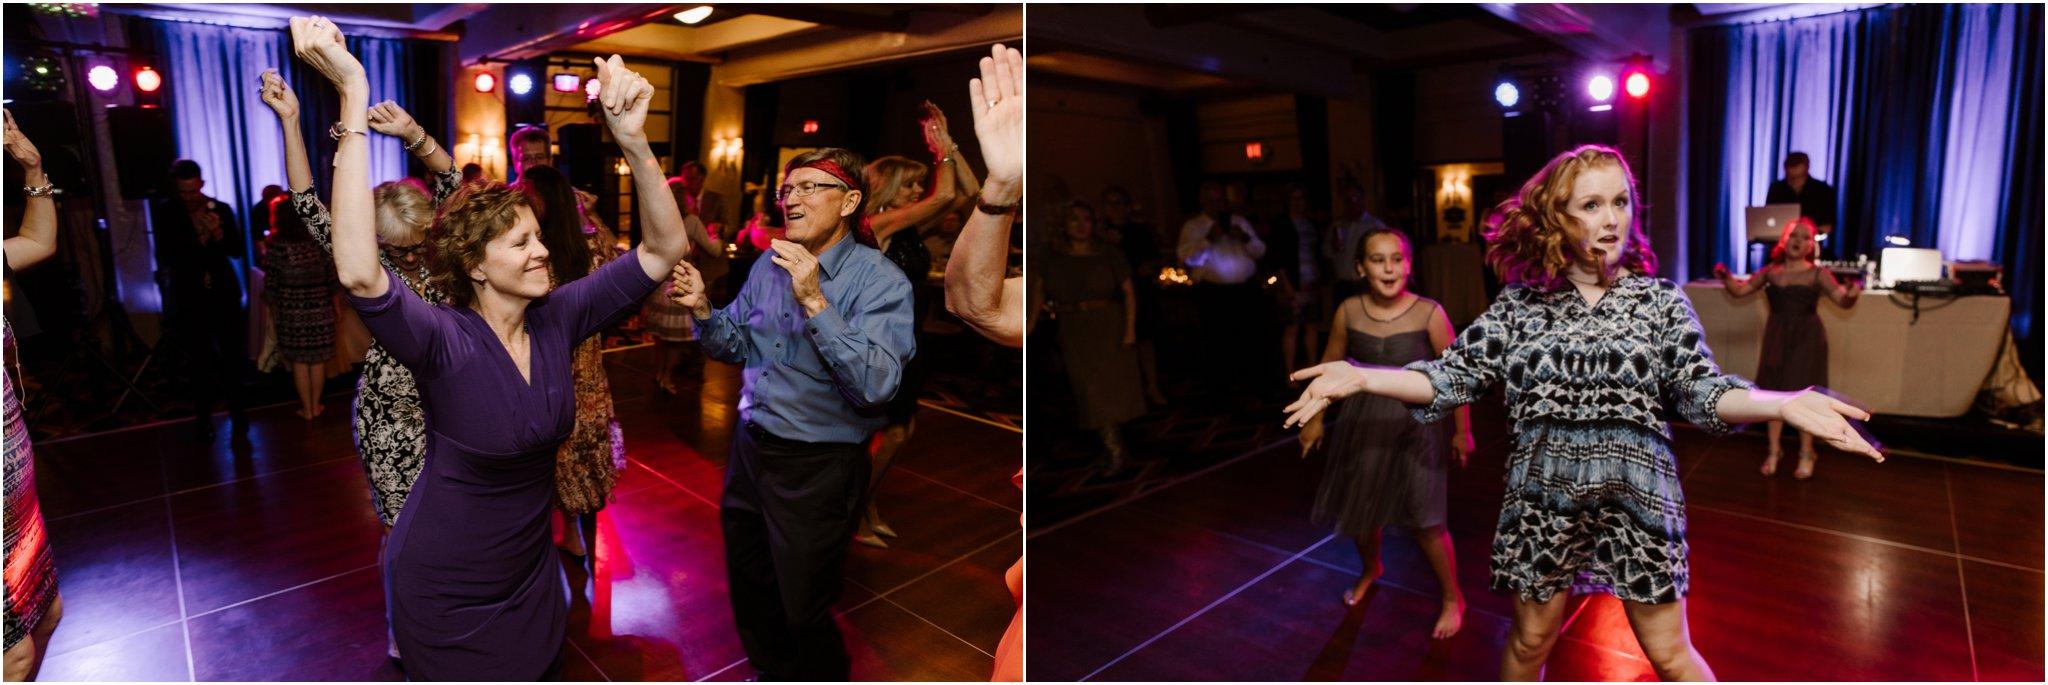 0058Santa Fe Wedding _Inn and Spa at Loretto Wedding, Inn and Spa at Loretto wedding, Santa Fe wedding photographers, blue rose photography